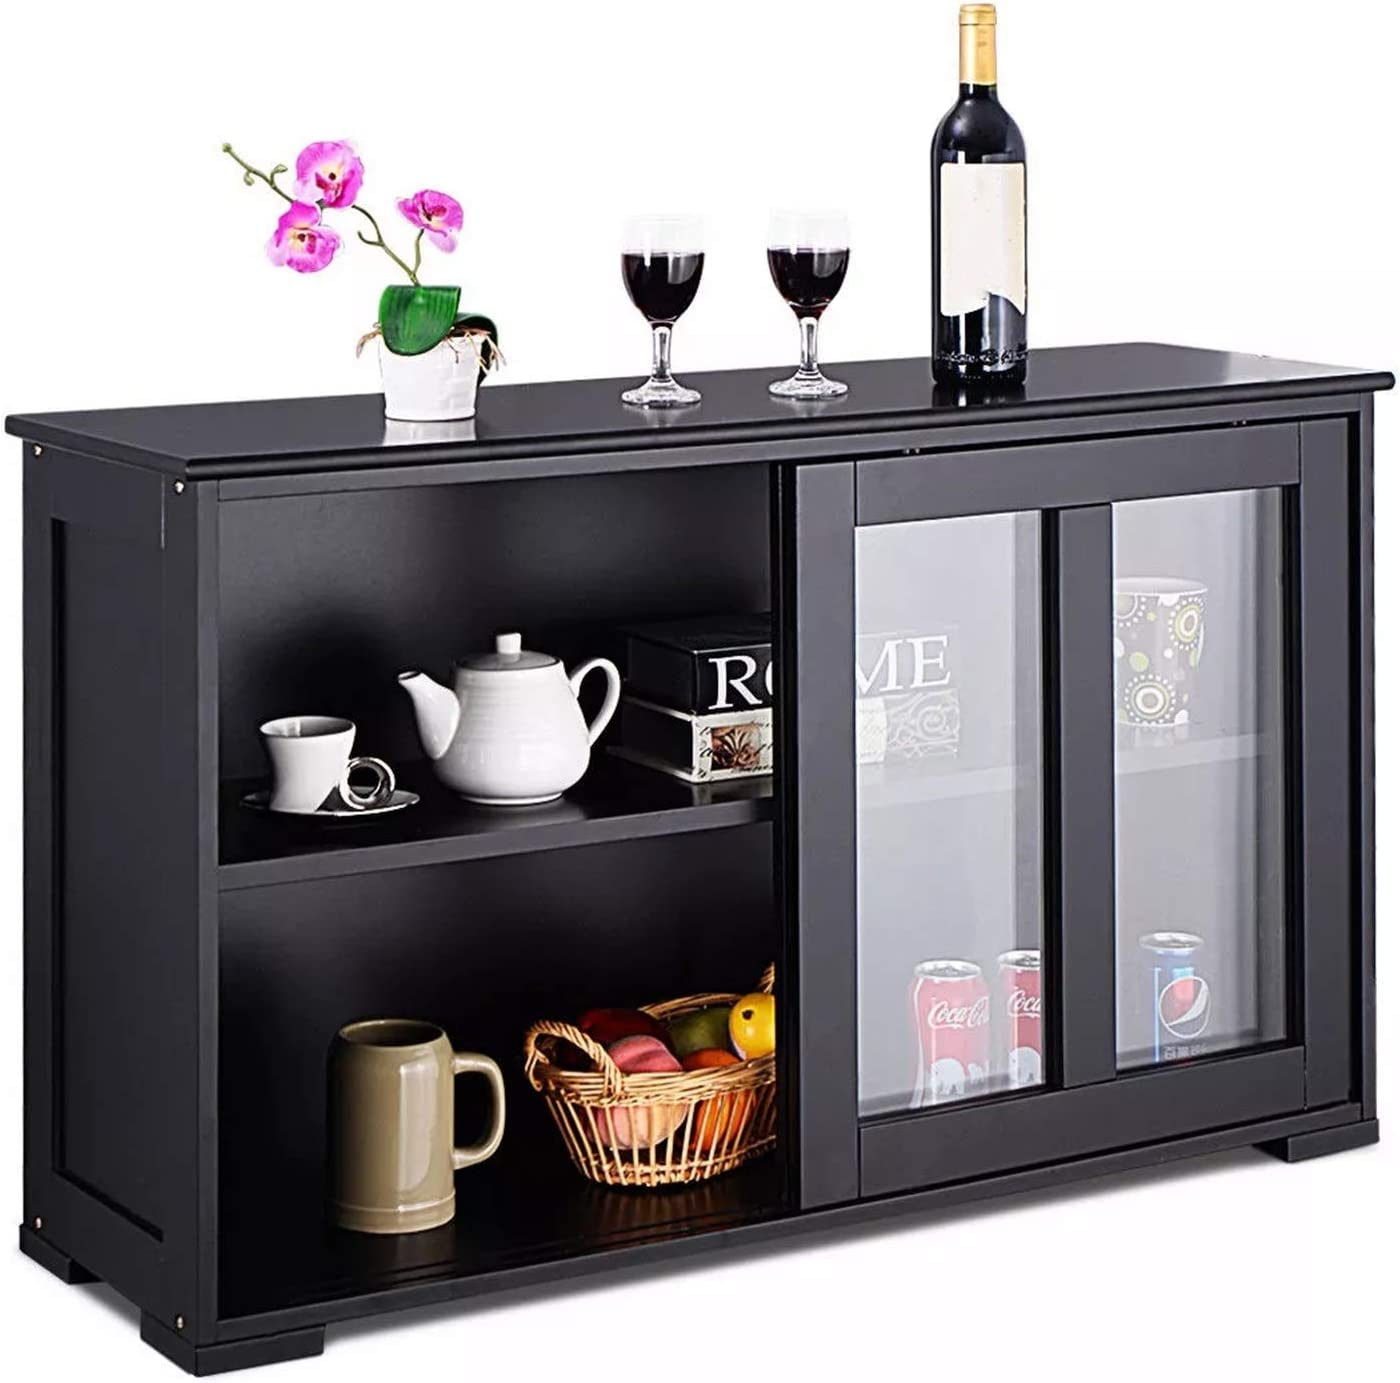 YADSHENG Sideboard Storage Cabinet Gla shopping Cupboard Buffet Superlatite